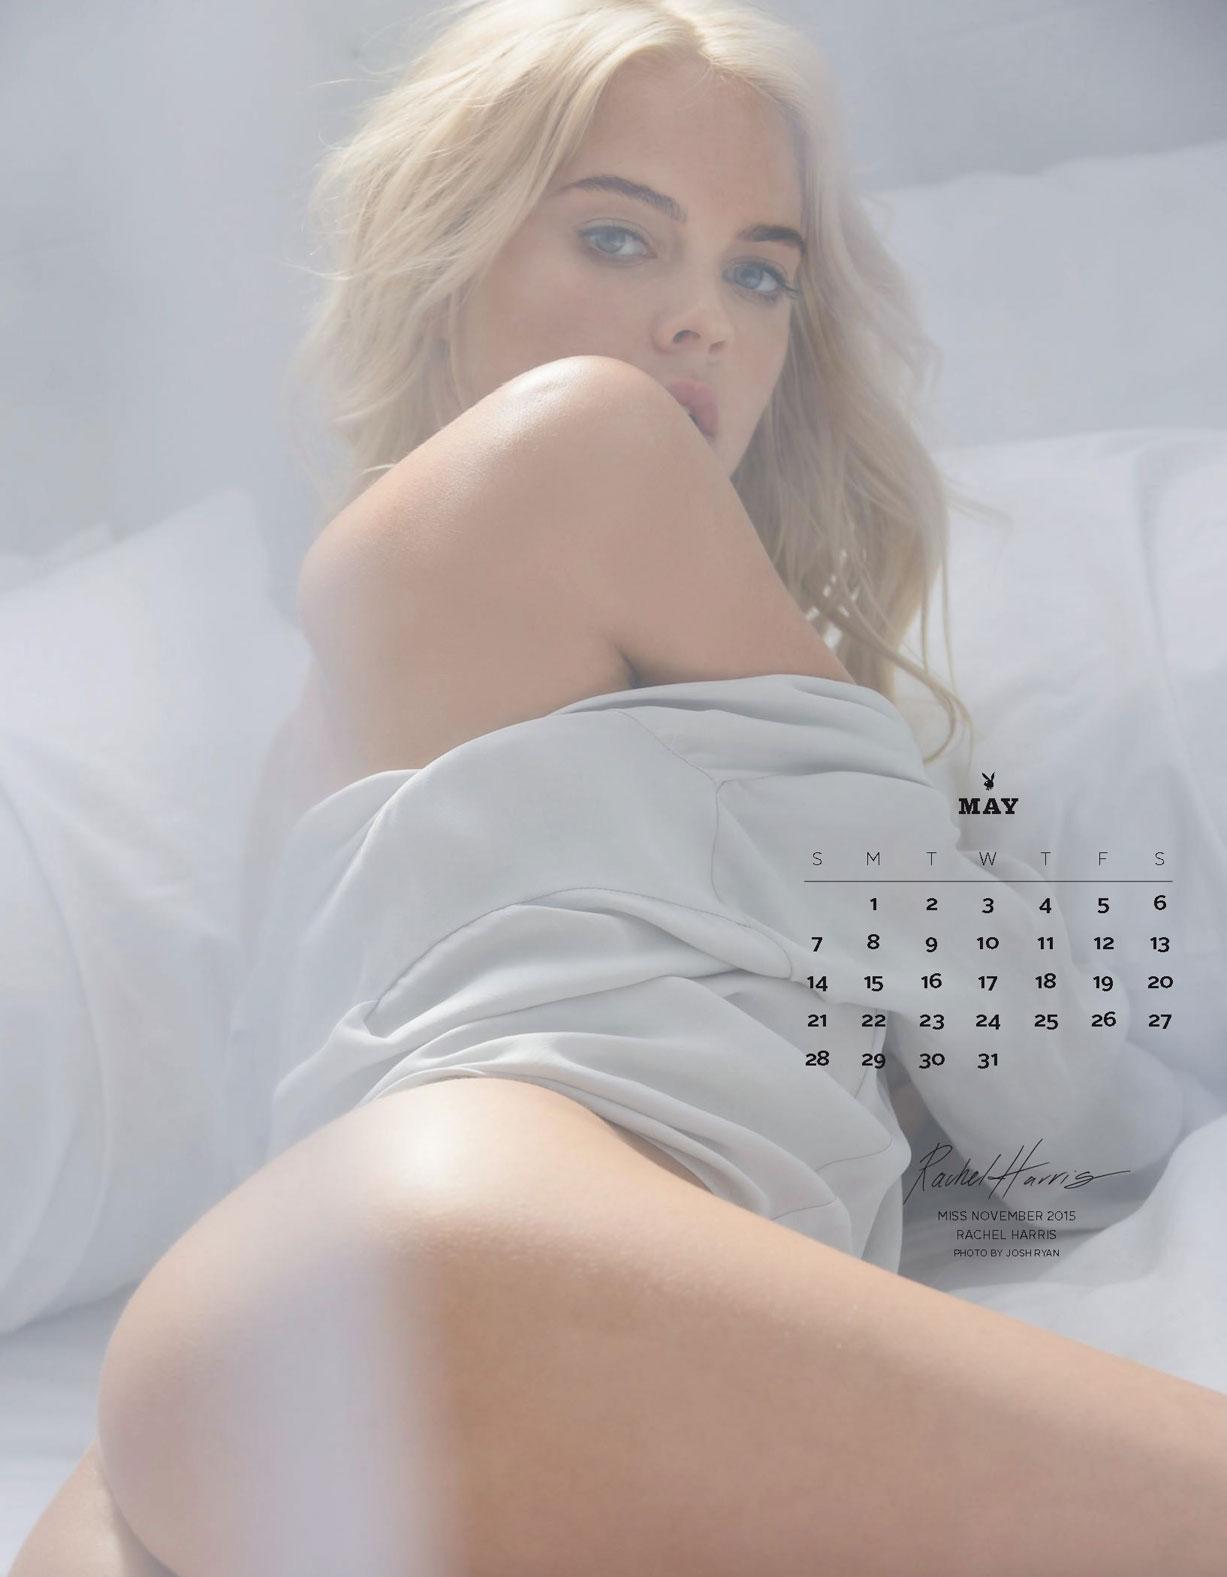 Playboy US Playmates 2017 calendar - Miss November 2015 Rachel Harris / Рейчел Харрис – Девушка месяца ноябрь 2015 журнала Плейбой США